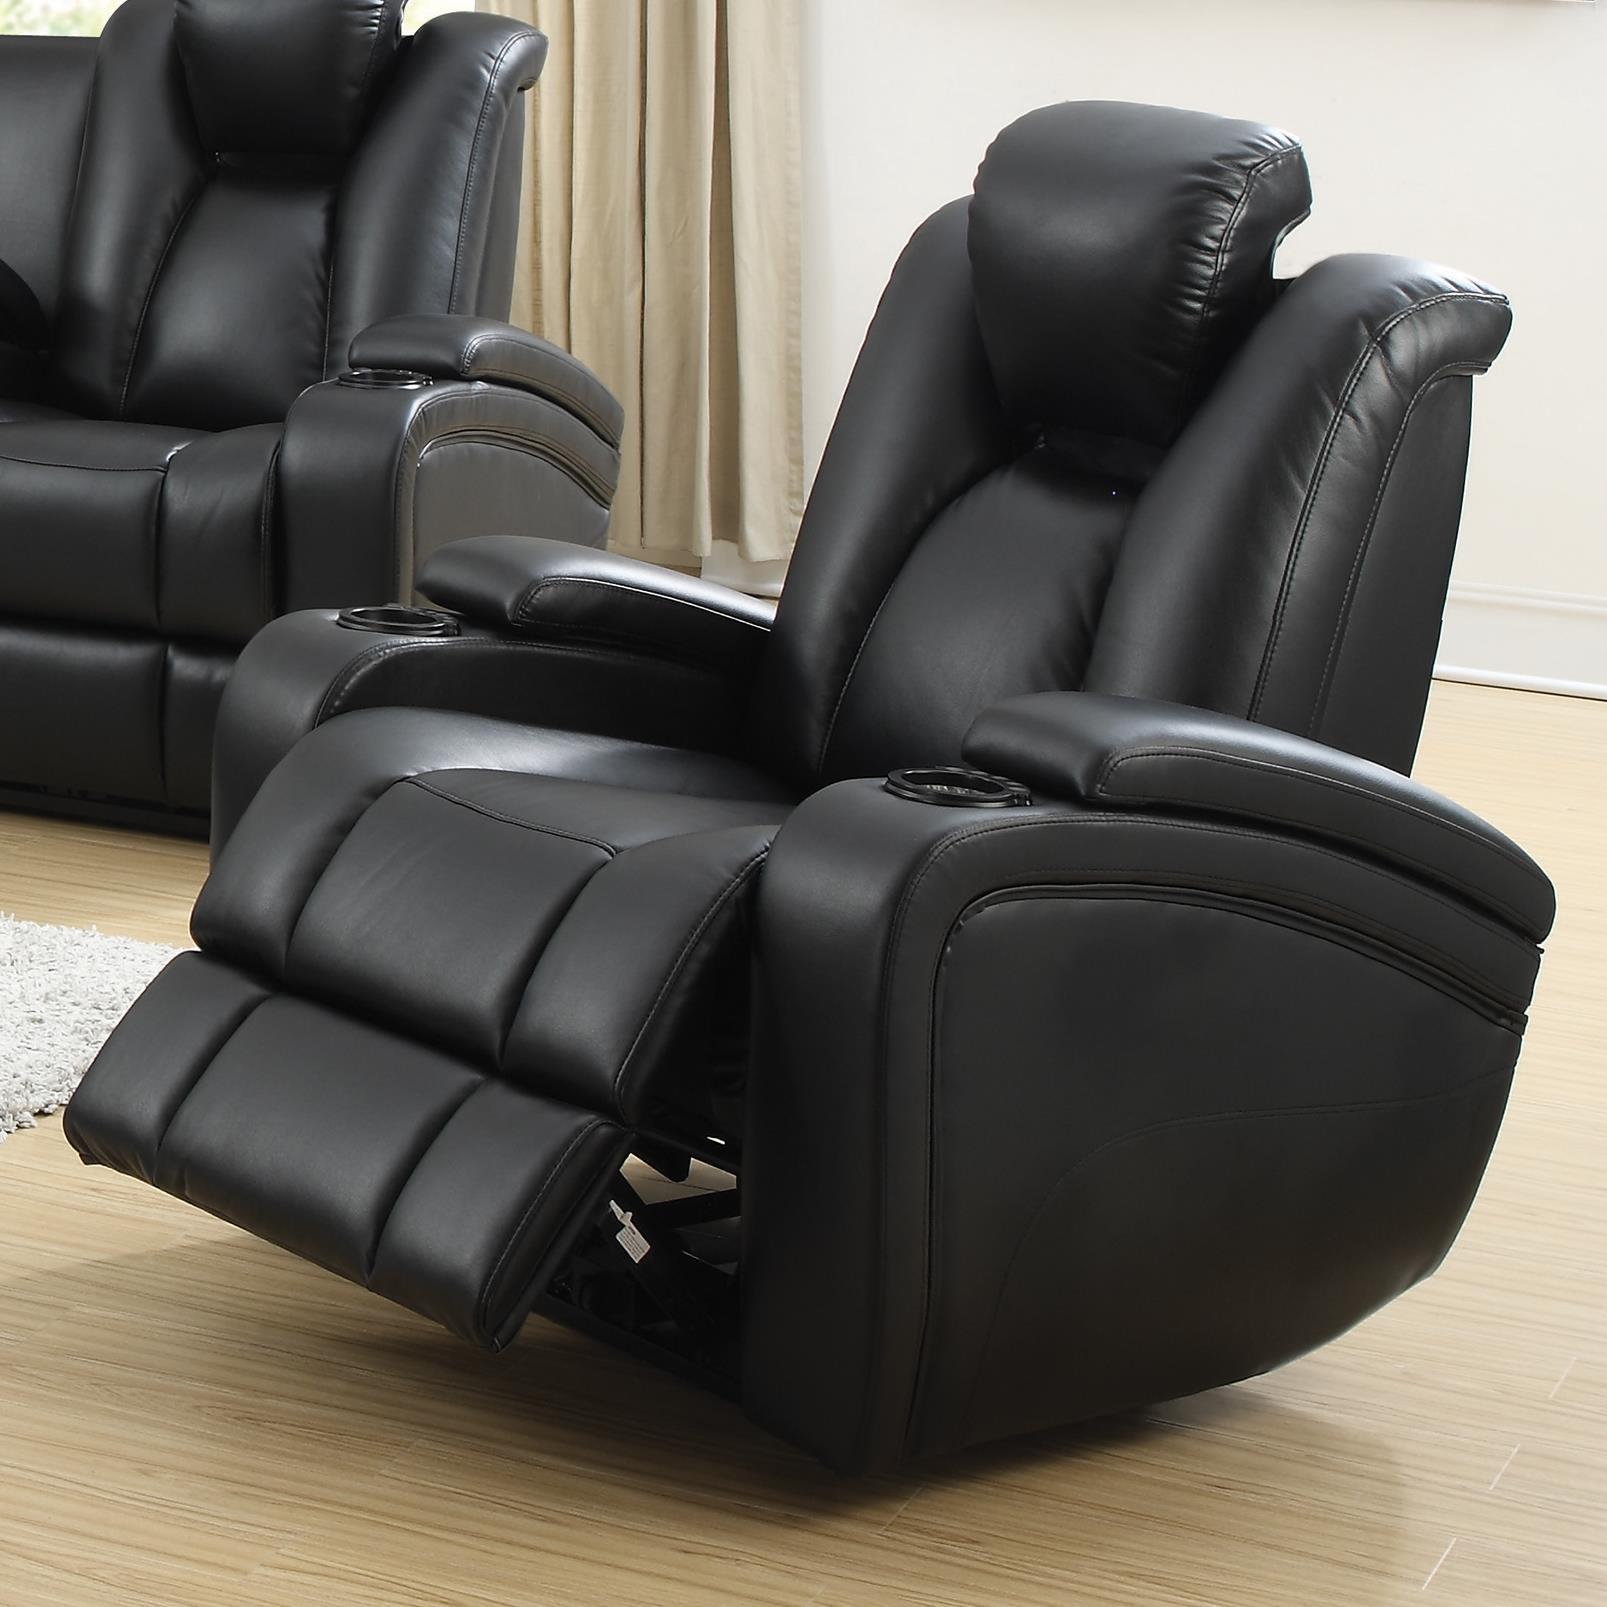 Power Recliner with Adjustable Headrest & Storage in Armrests